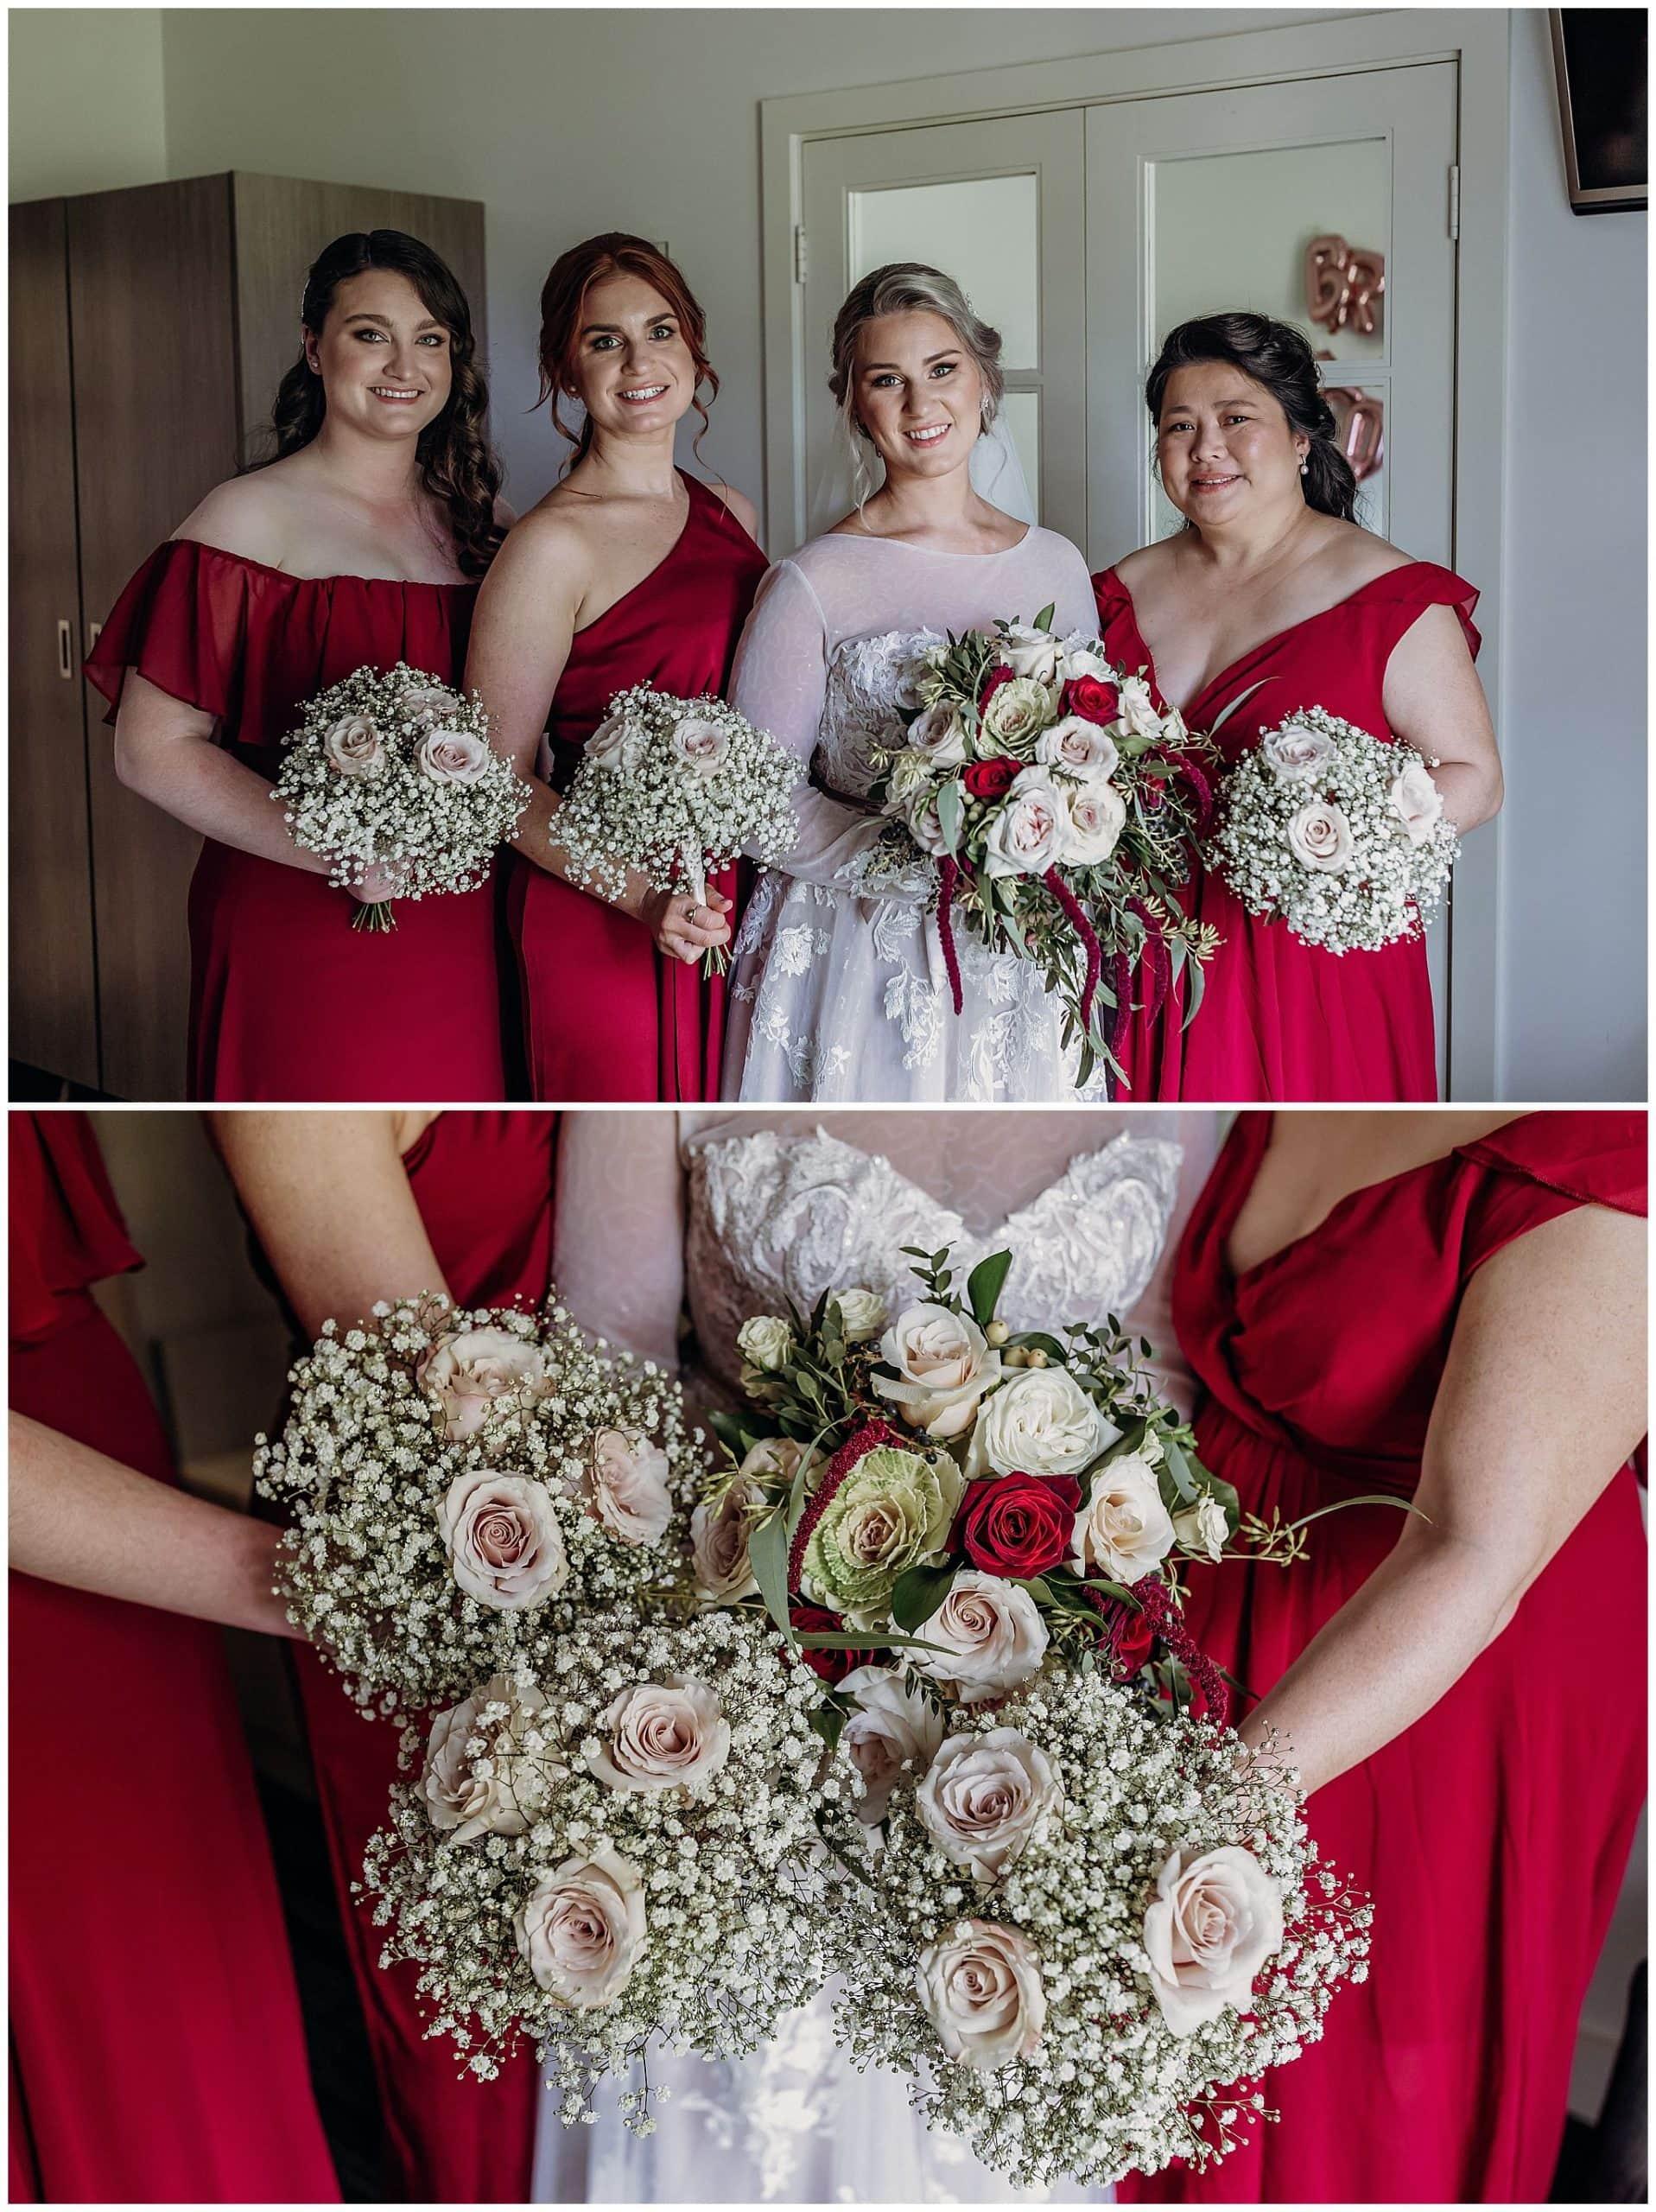 vines-resort-wedding-bride-getting-ready